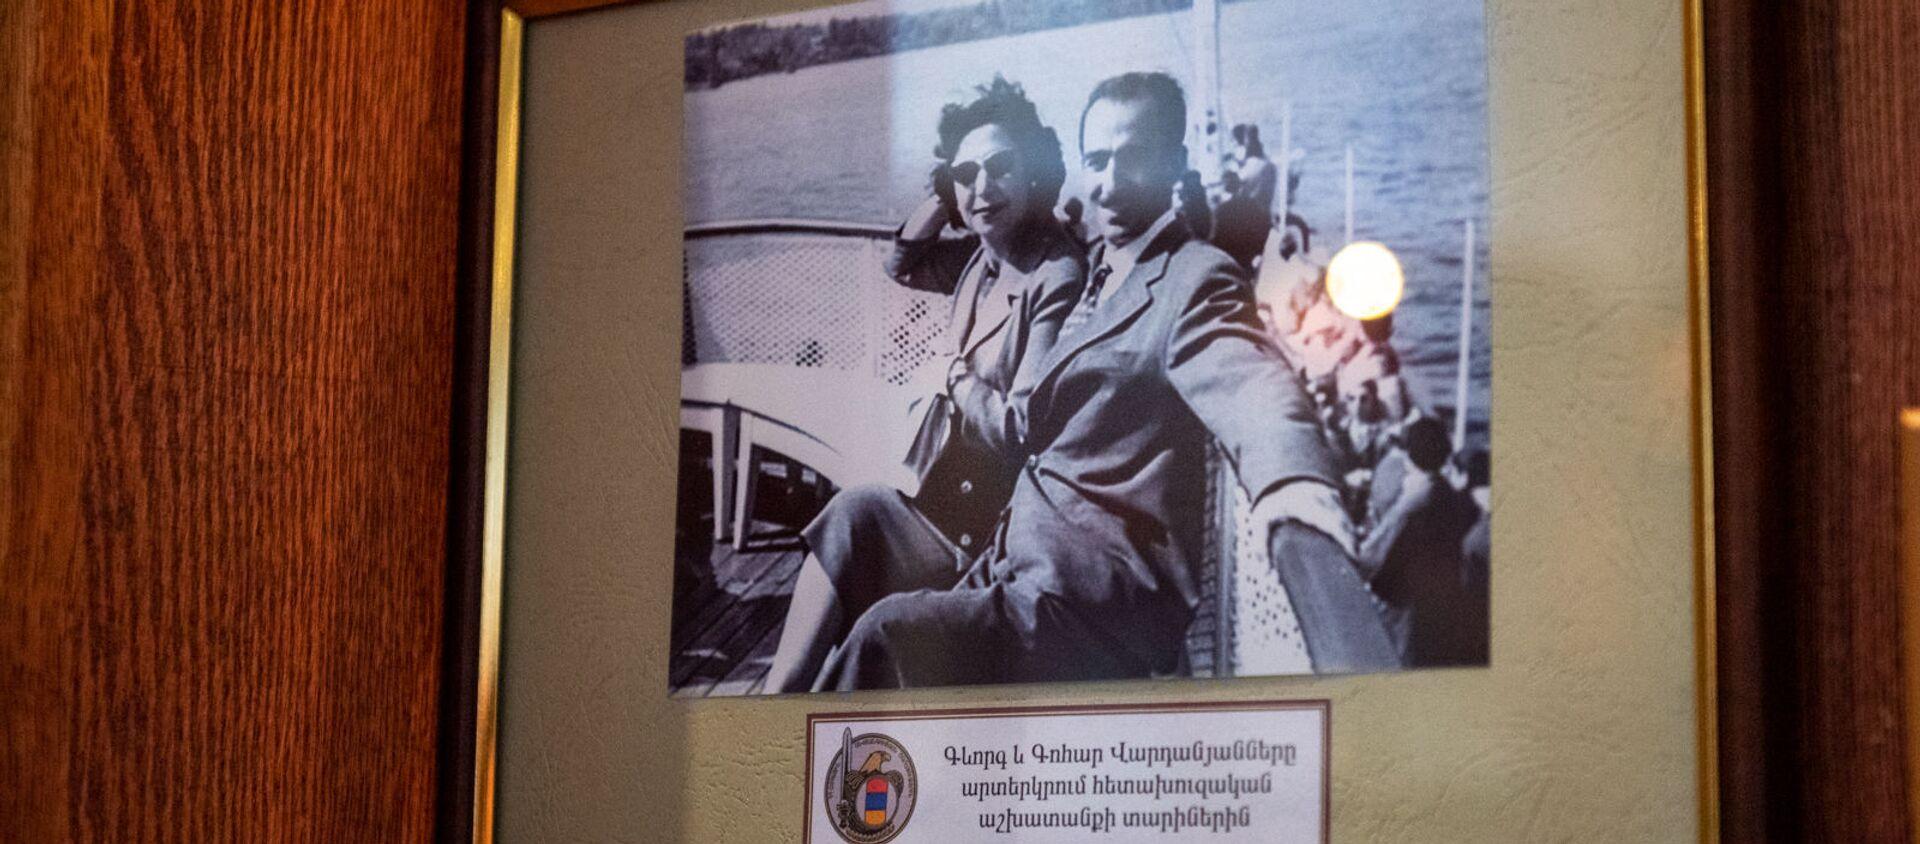 Фотография Геворка и Гоар Вартанян в музее СНБ Армении - Sputnik Արմենիա, 1920, 10.01.2020